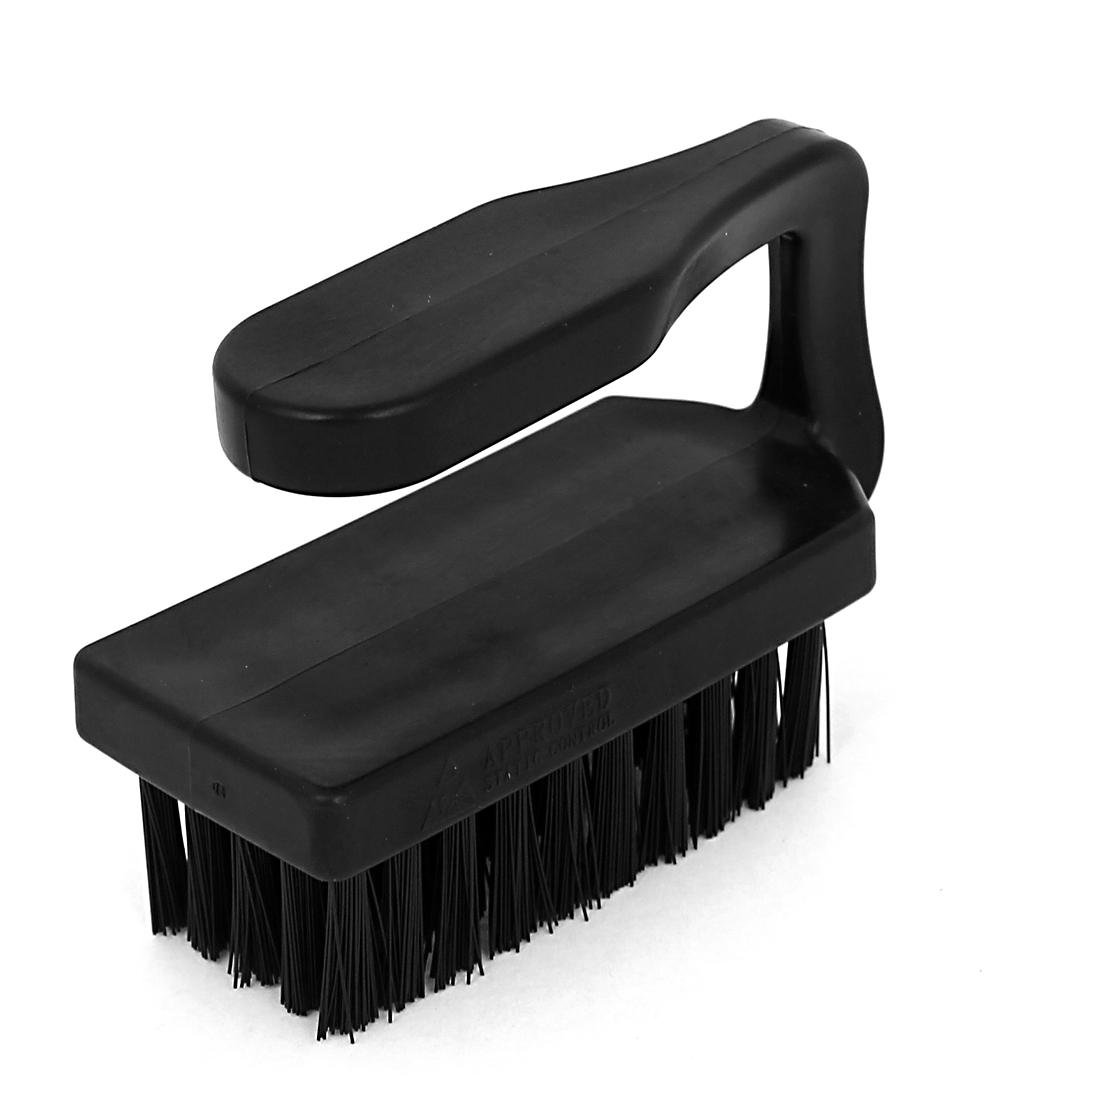 Horizontal Handle Bristle ESD Anti Static Brush PCB Cleaning Tool 9cm Long